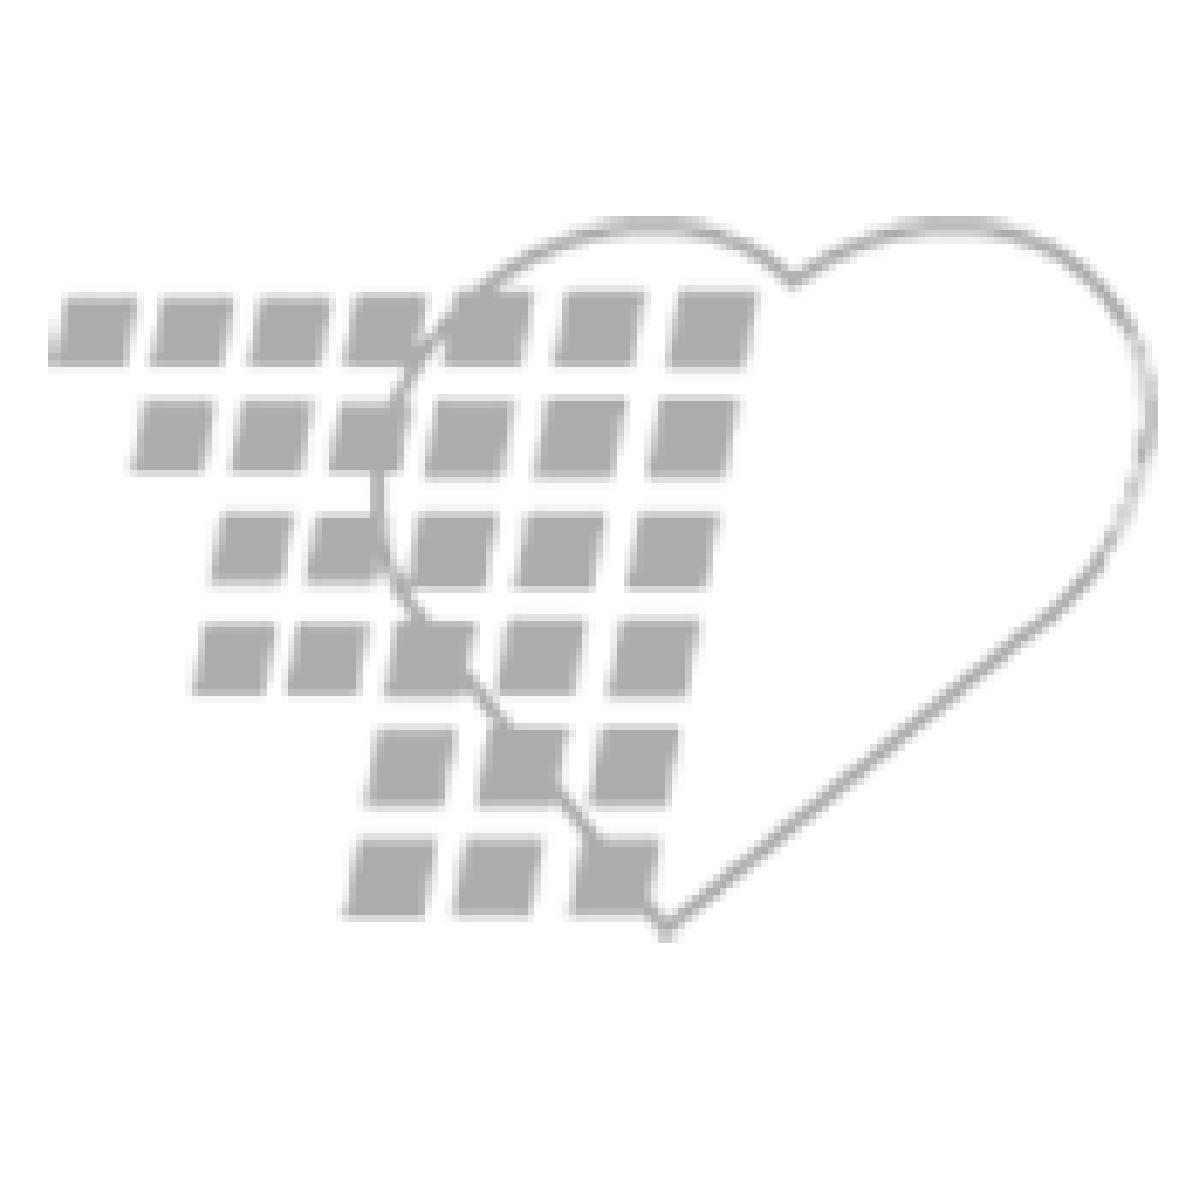 05-46-0604 Kangaroo Neonatal/Pediatric Feeding Tubes with Safe Enteral Connections